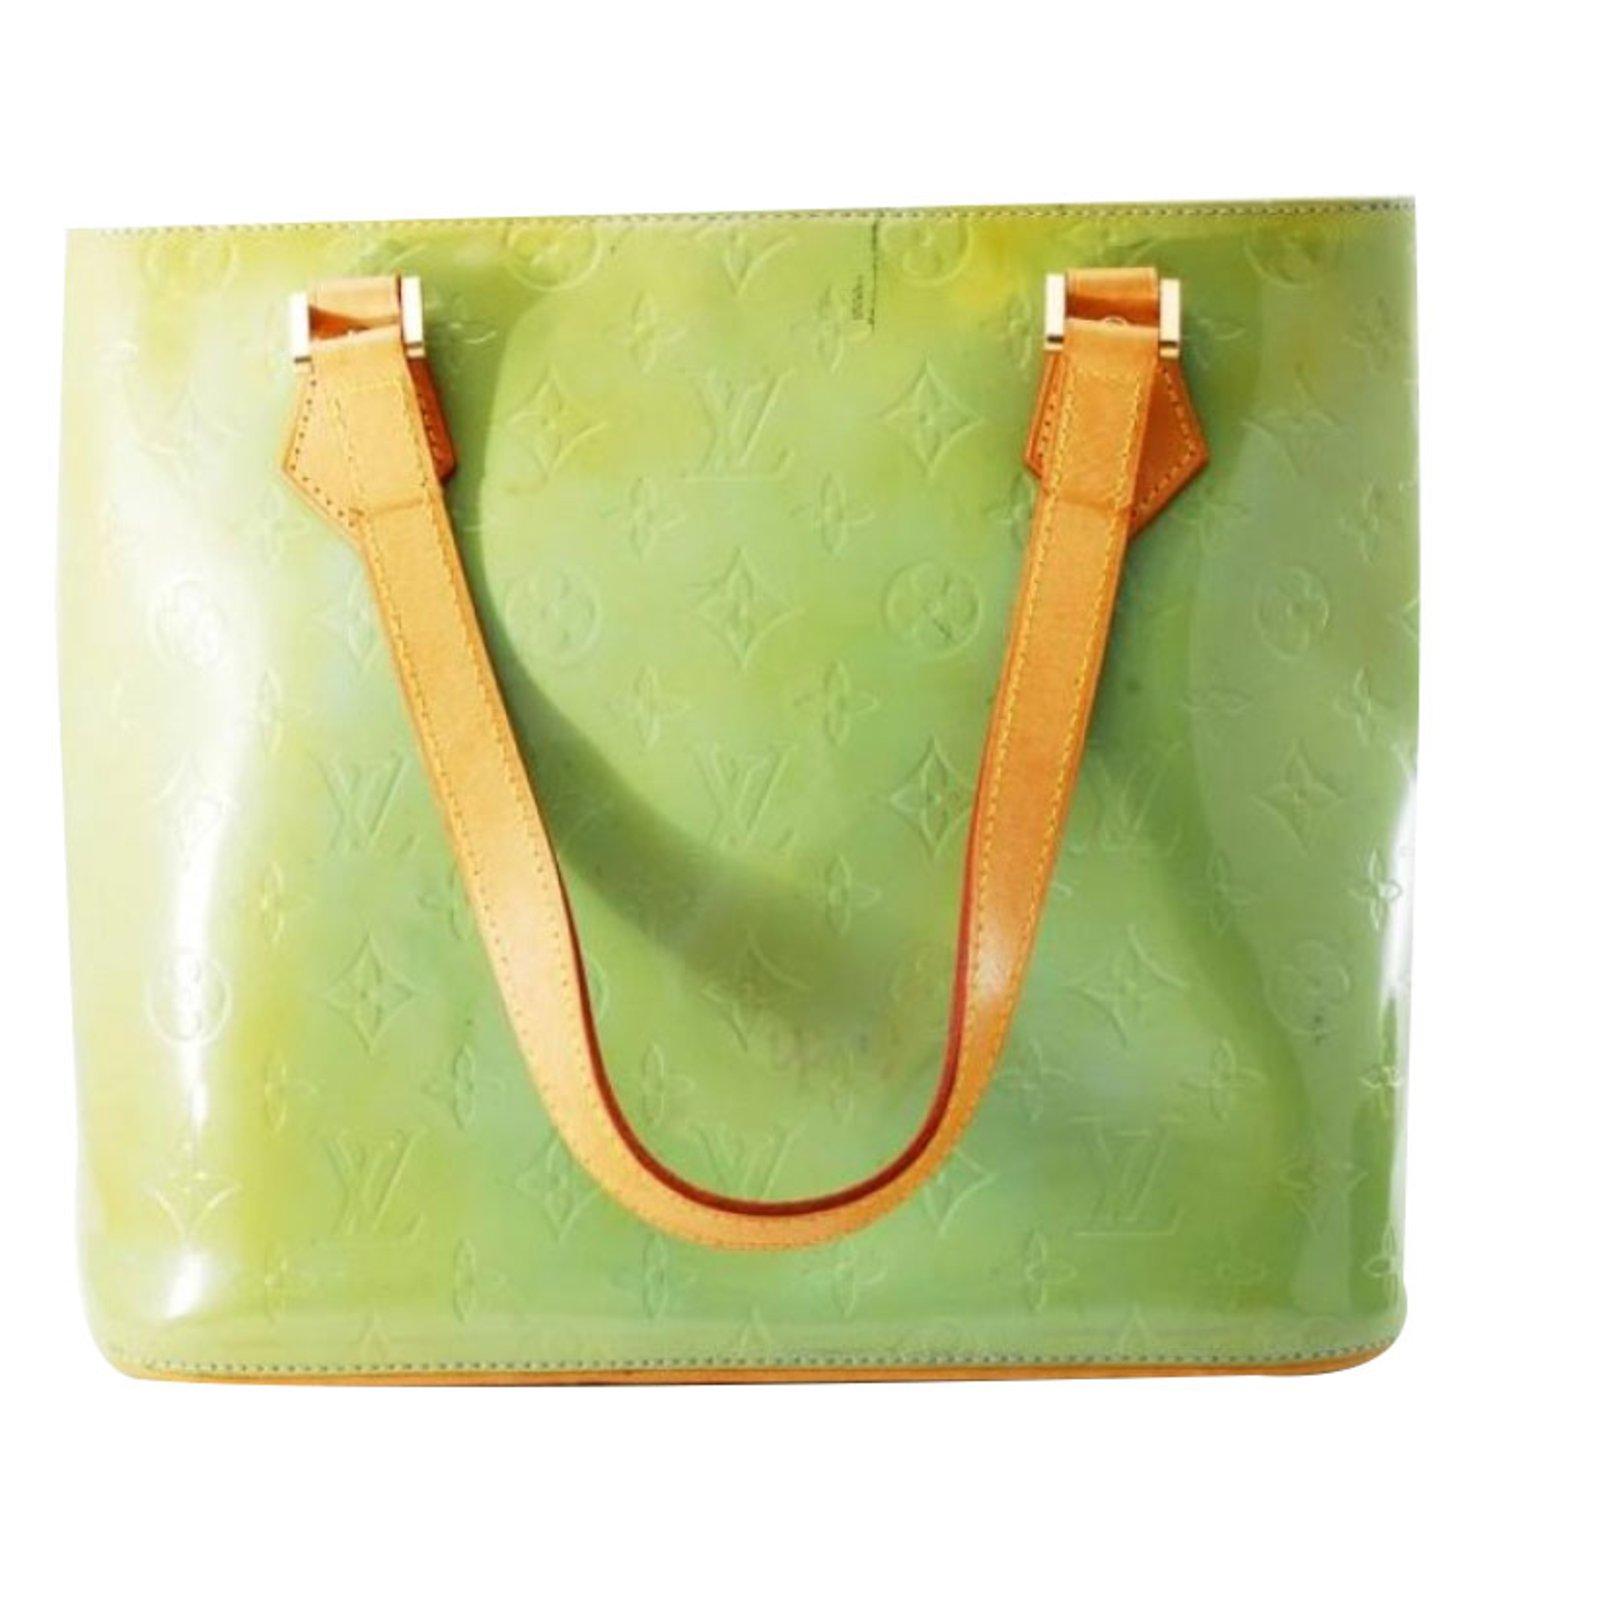 Sacs à main Louis Vuitton Sacs à main Cuir vernis Vert ref.78471 ... ba95fd0cea2